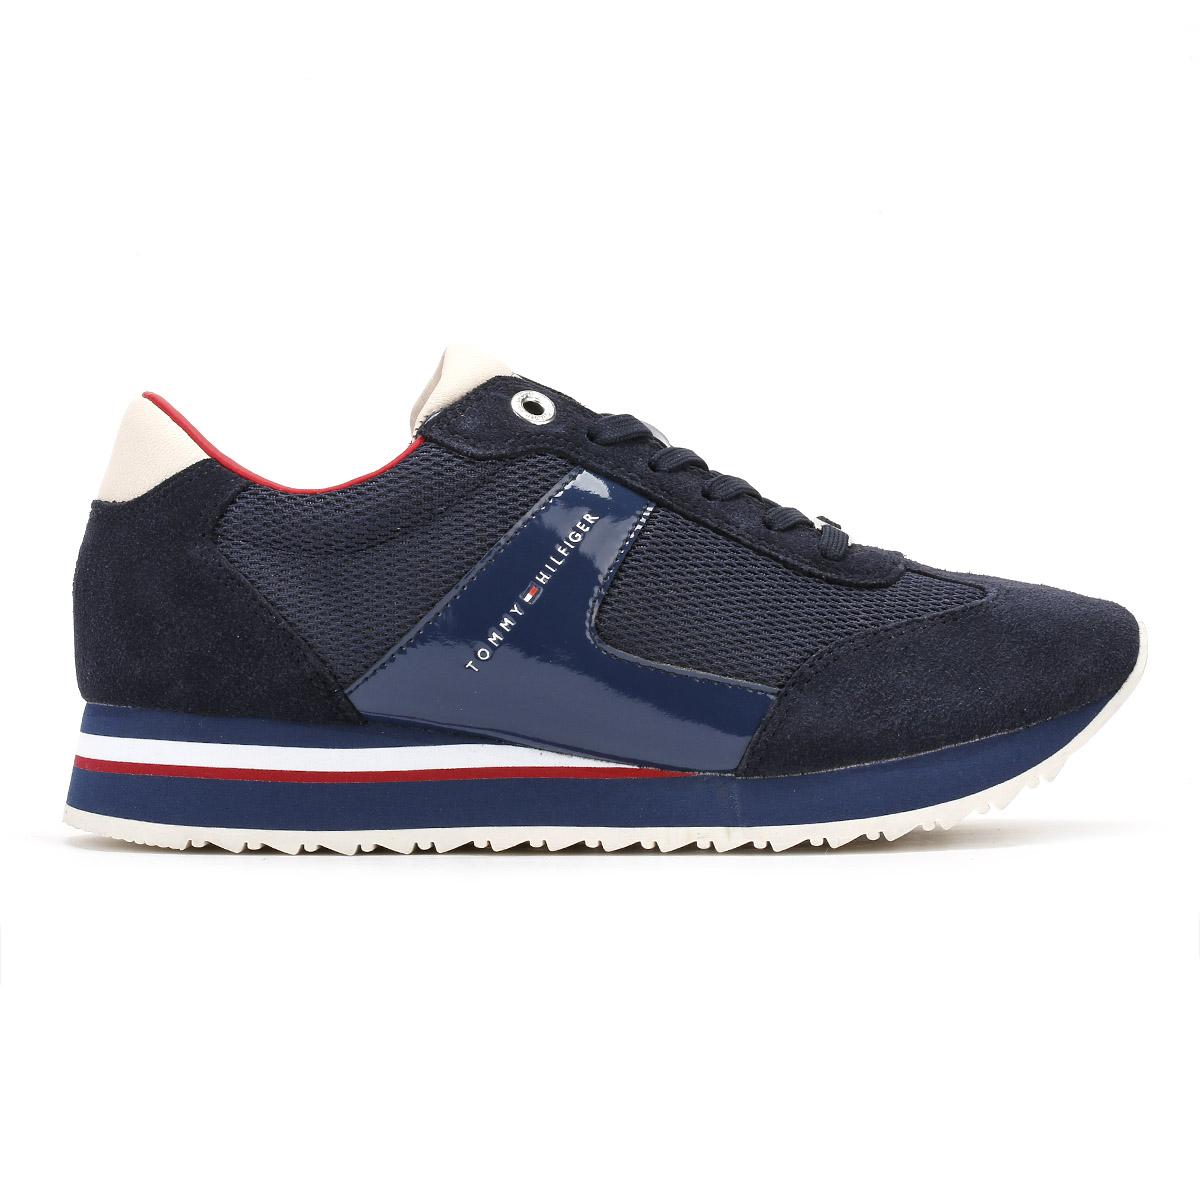 tommy hilfiger womens trainers navy blue 1c1 runner. Black Bedroom Furniture Sets. Home Design Ideas